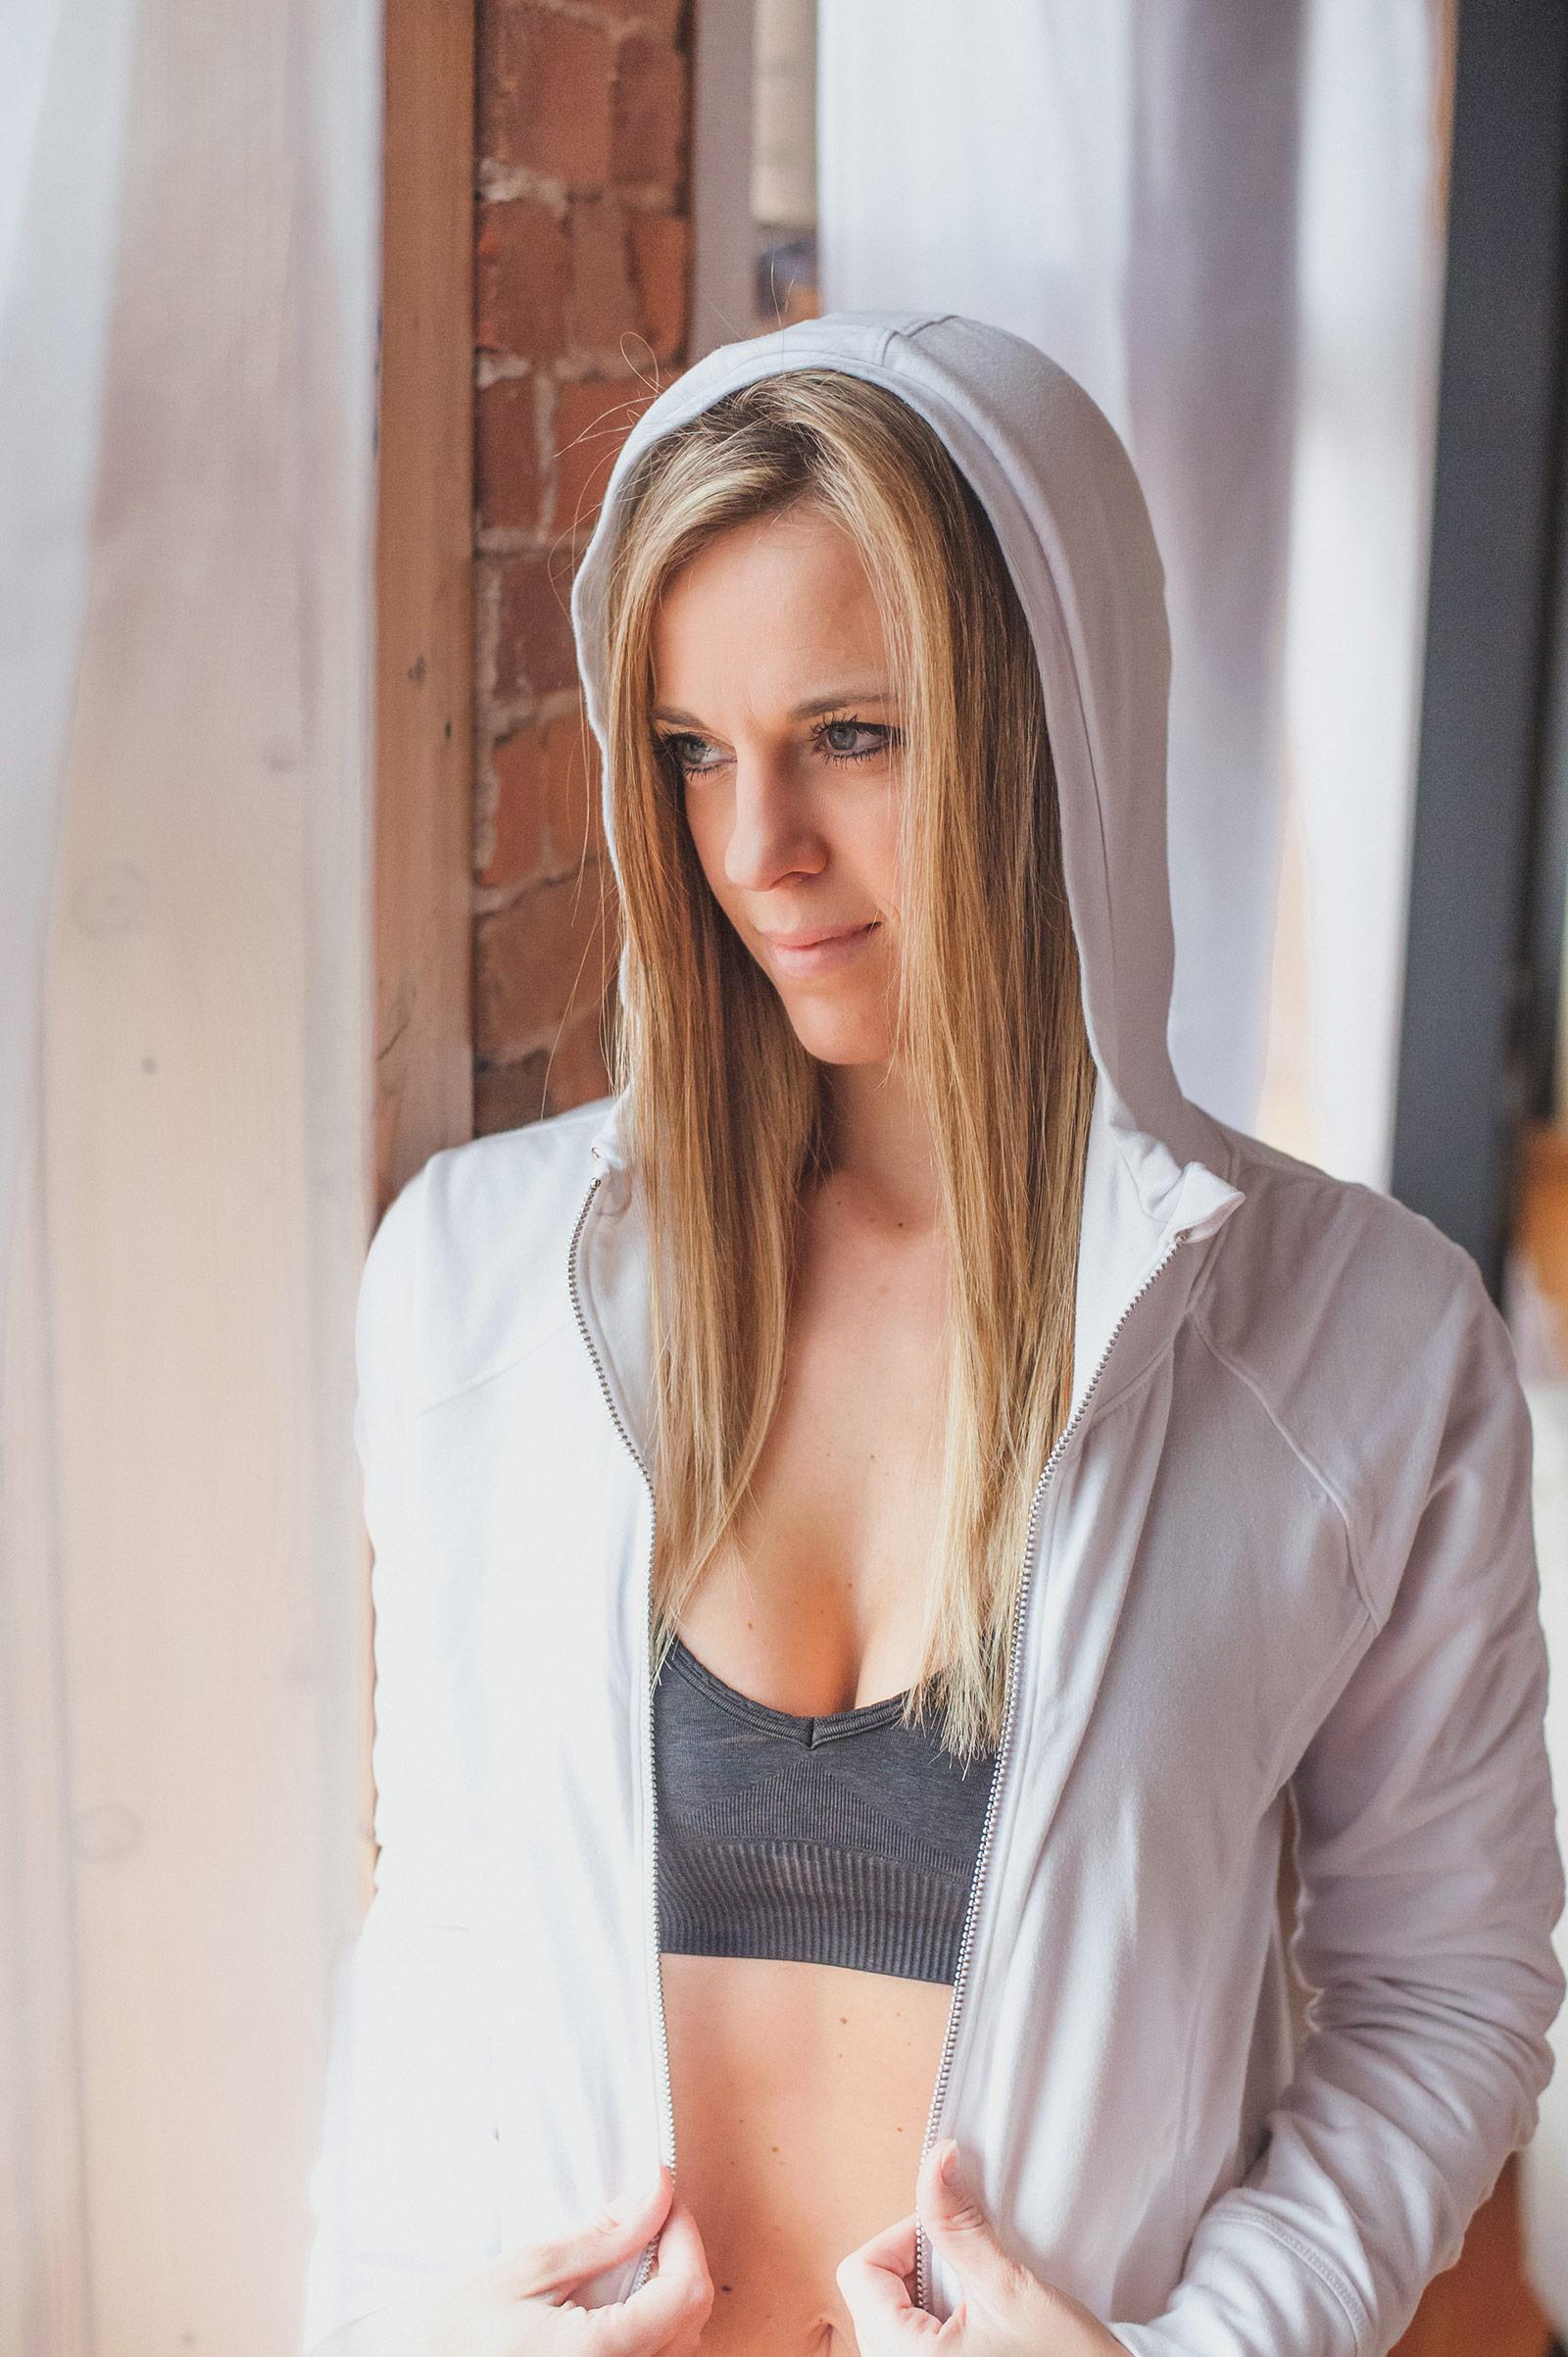 jenny-mire-fitness-photography2.jpg